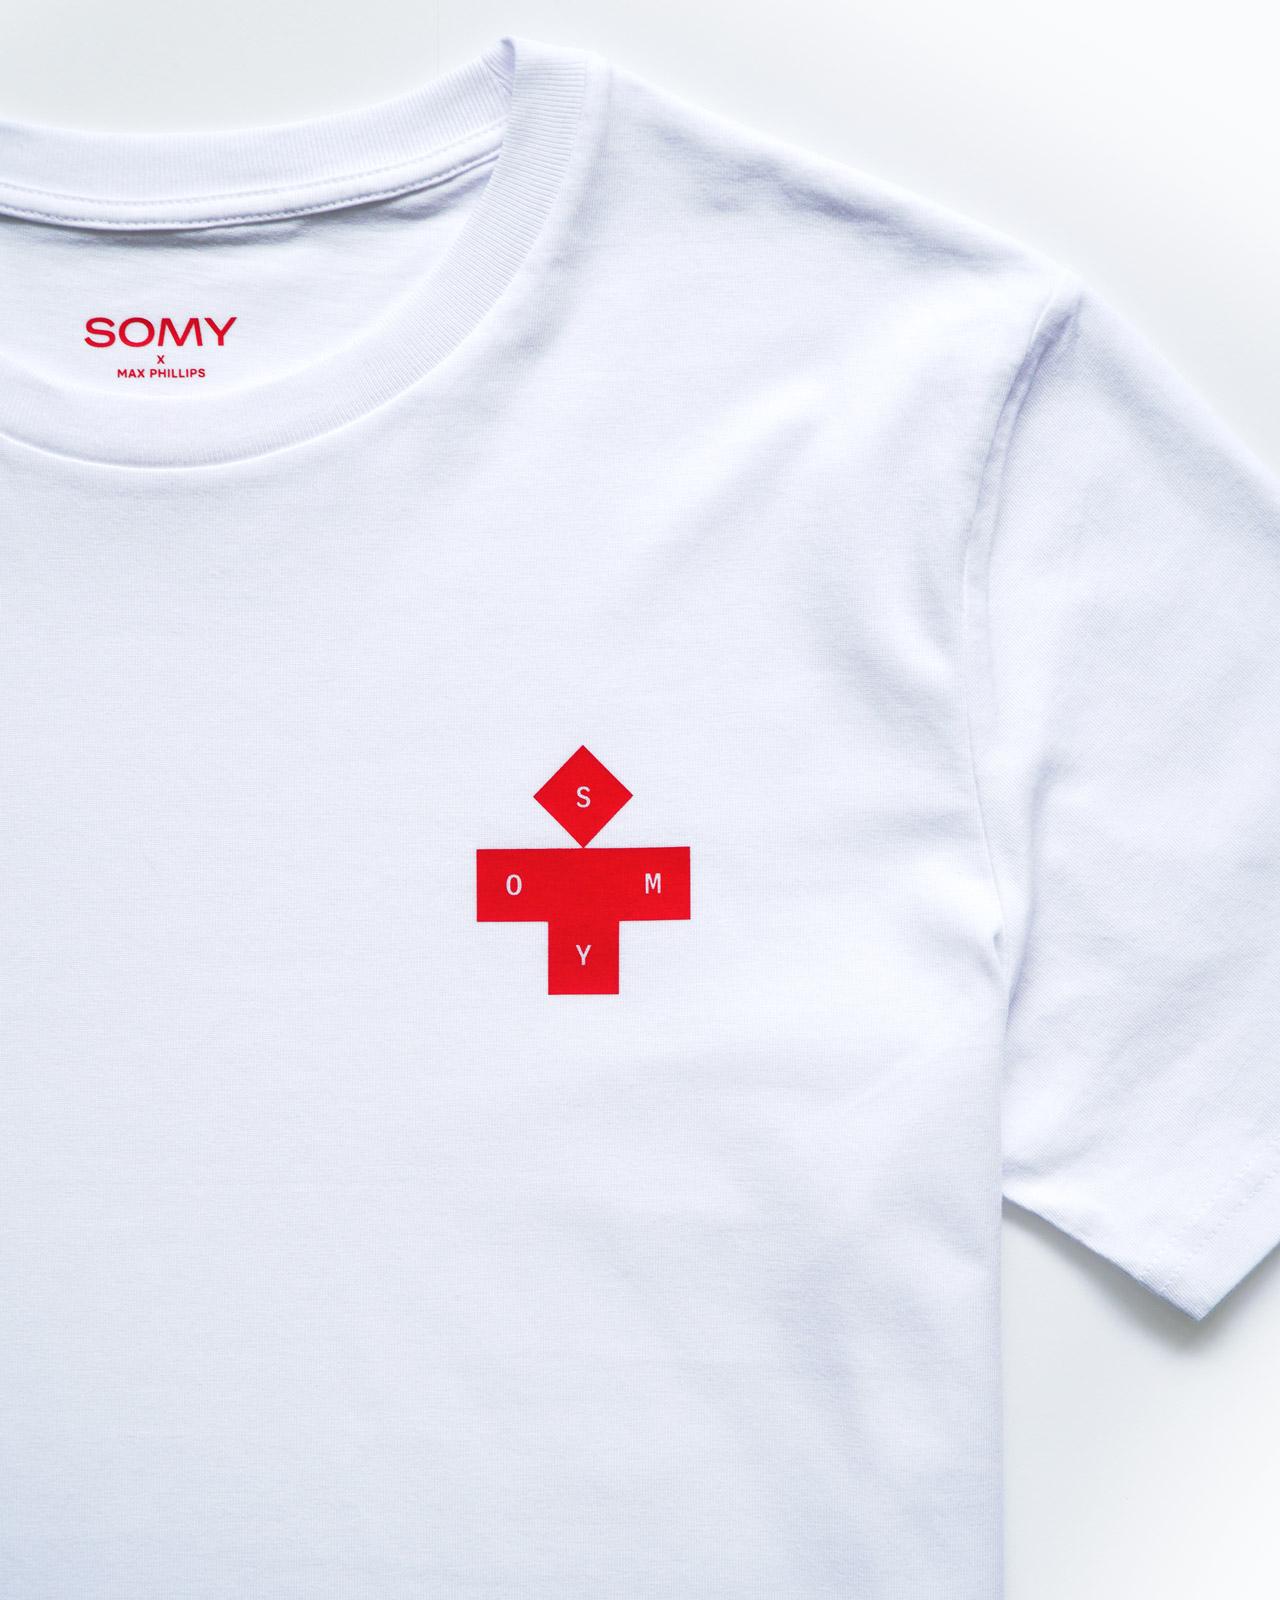 SOMY x Max Phillips, SOMY x Max Phillips Signal Type Foundry, SOMY x Max Phillips T-Shirt, SOMY x Max Phillips tee, SOMY x Max Phillips tshirt, Ireland, SOMY t-shirt, SOMY Artist Series t-shirt, SOMY Artist Series tshirt, SOMY artist series tee, SOMY artist series, SOMY clothing, SOMY clothing brand Ireland, SOMY Ireland, SOMY is a design driven lifestyle brand, SOMY lifestyle, SOMY skateboarding Ireland, SOMY Skatewear Ireland, SOMY Streetwear Ireland, SOMY style, SOMY Surfwear Ireland, graphic t-shirt, graphic tshirt, graphic tee